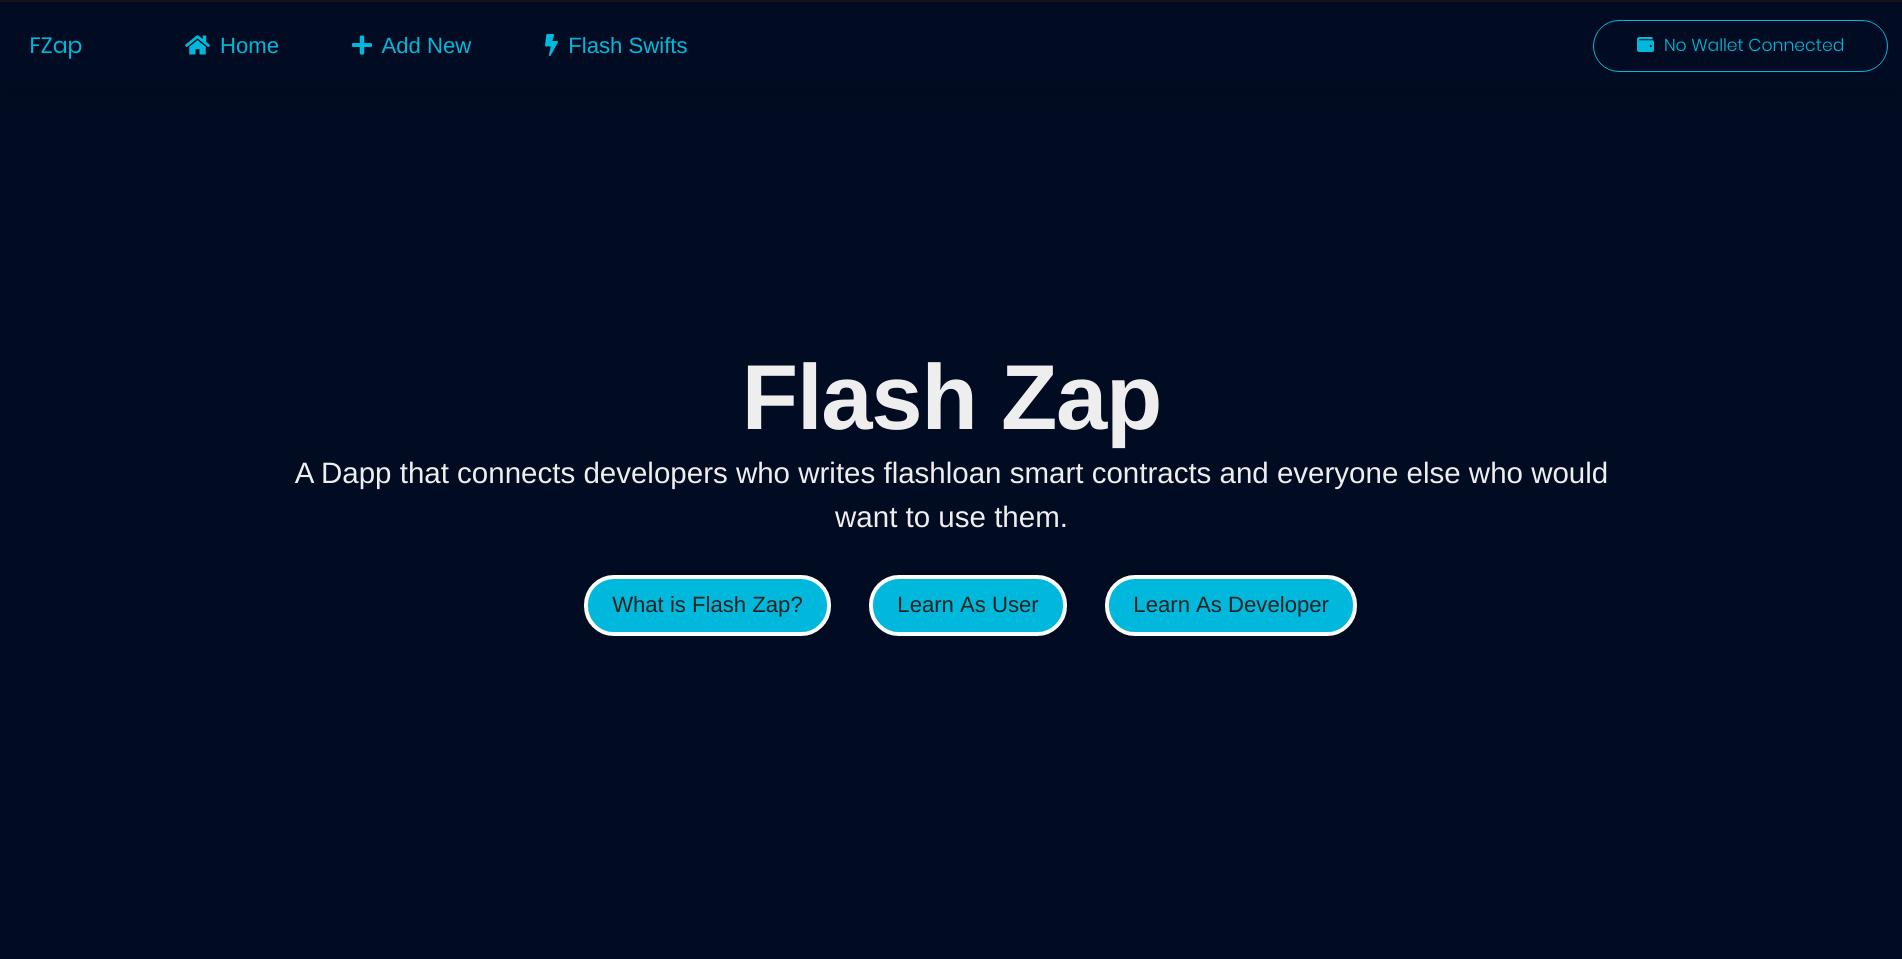 Flash Zaps showcase